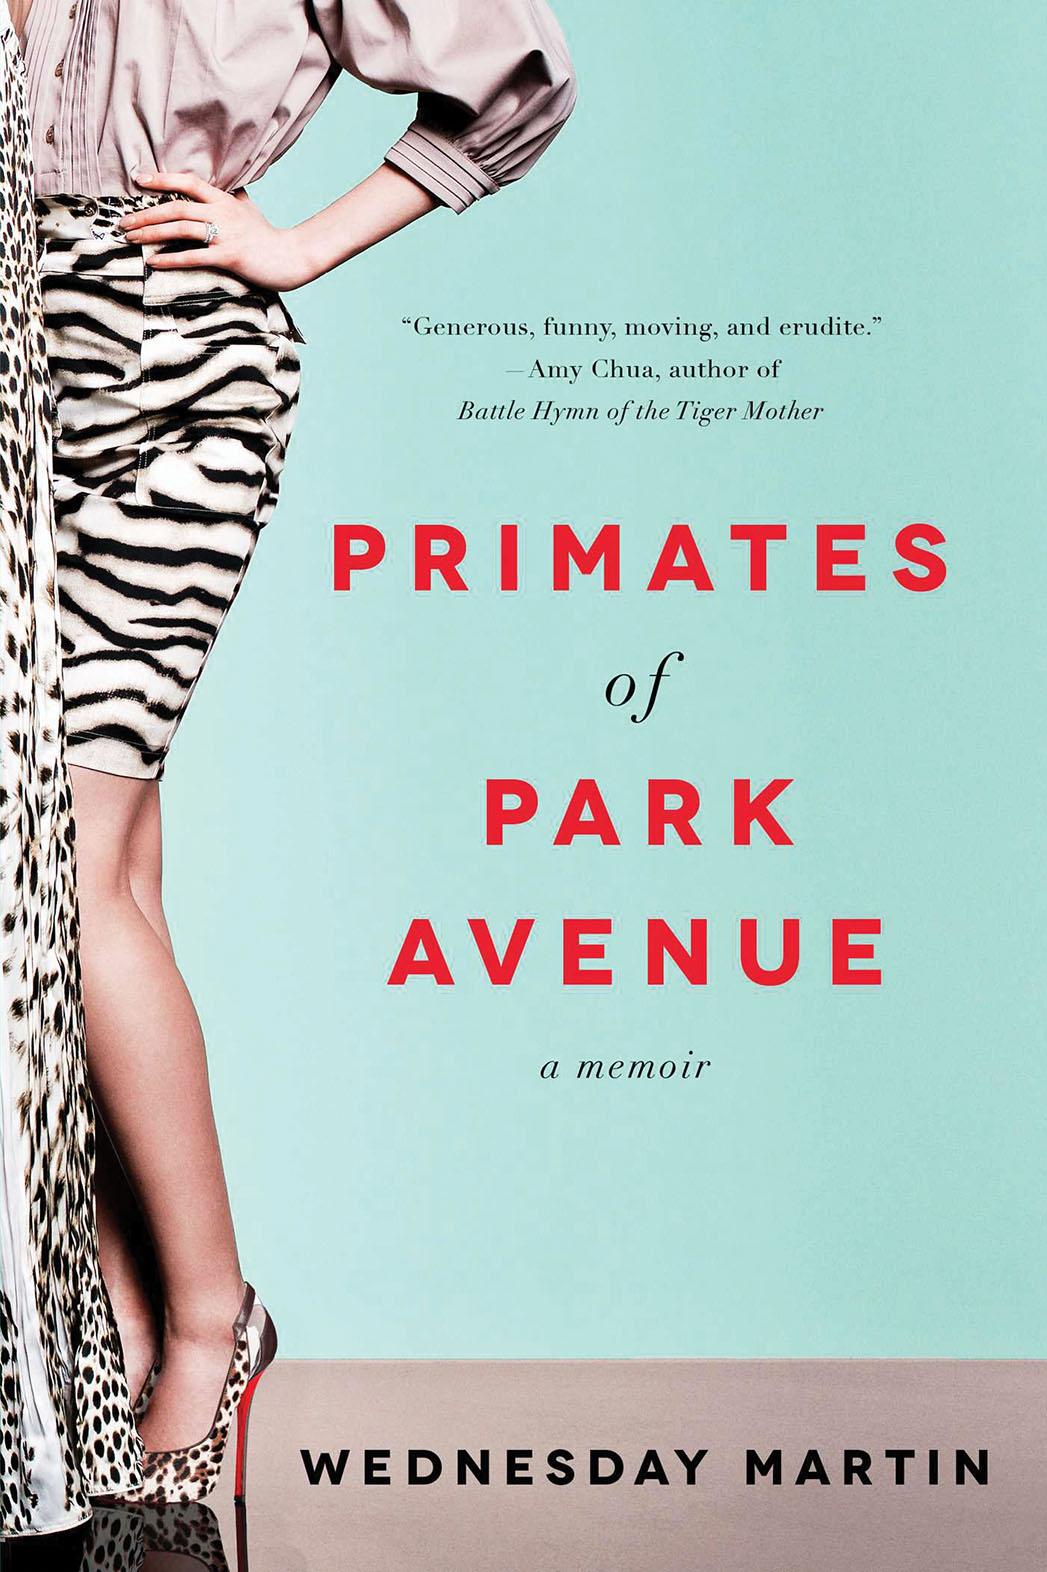 Primates of Park Avenue Cover - P 2015